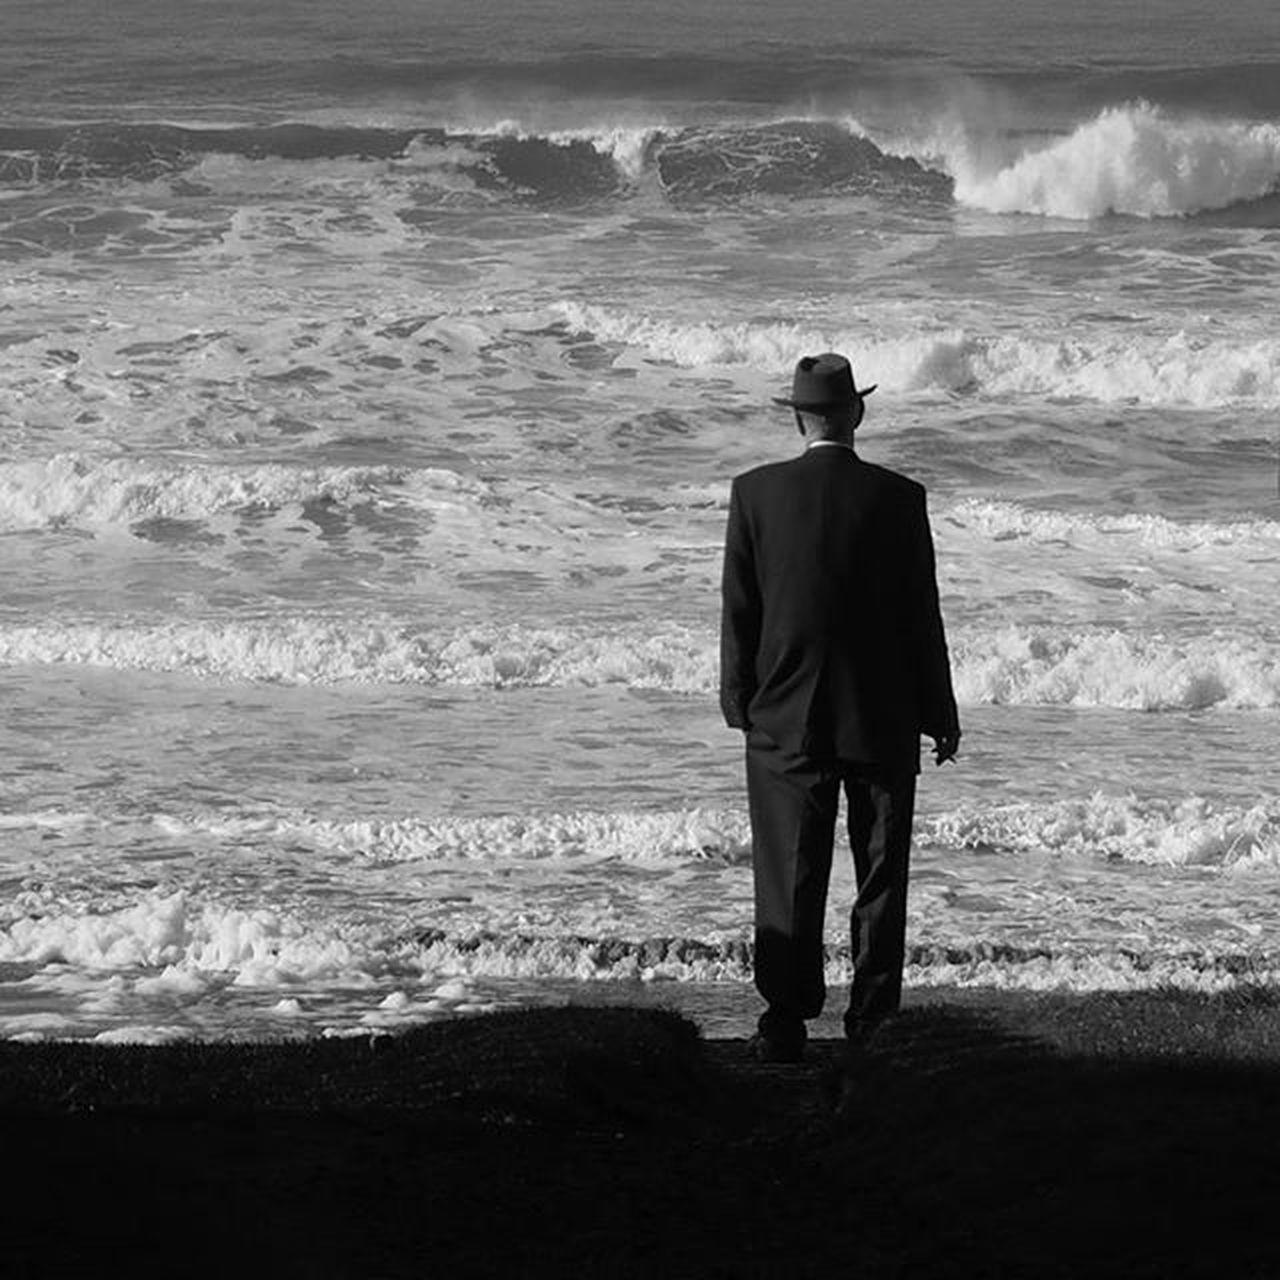 Solitude at the end of the earth ... Getolympus Omdem1 Olympusomdem1 Zuikodigital Blackandwhite Monochrome Monochromatic Blacknwhite Bnw Pacificnorthwest Pacificnw PNW PNWonderland Iloveoregon Upperleftusa Oregoncoast Hat Waves